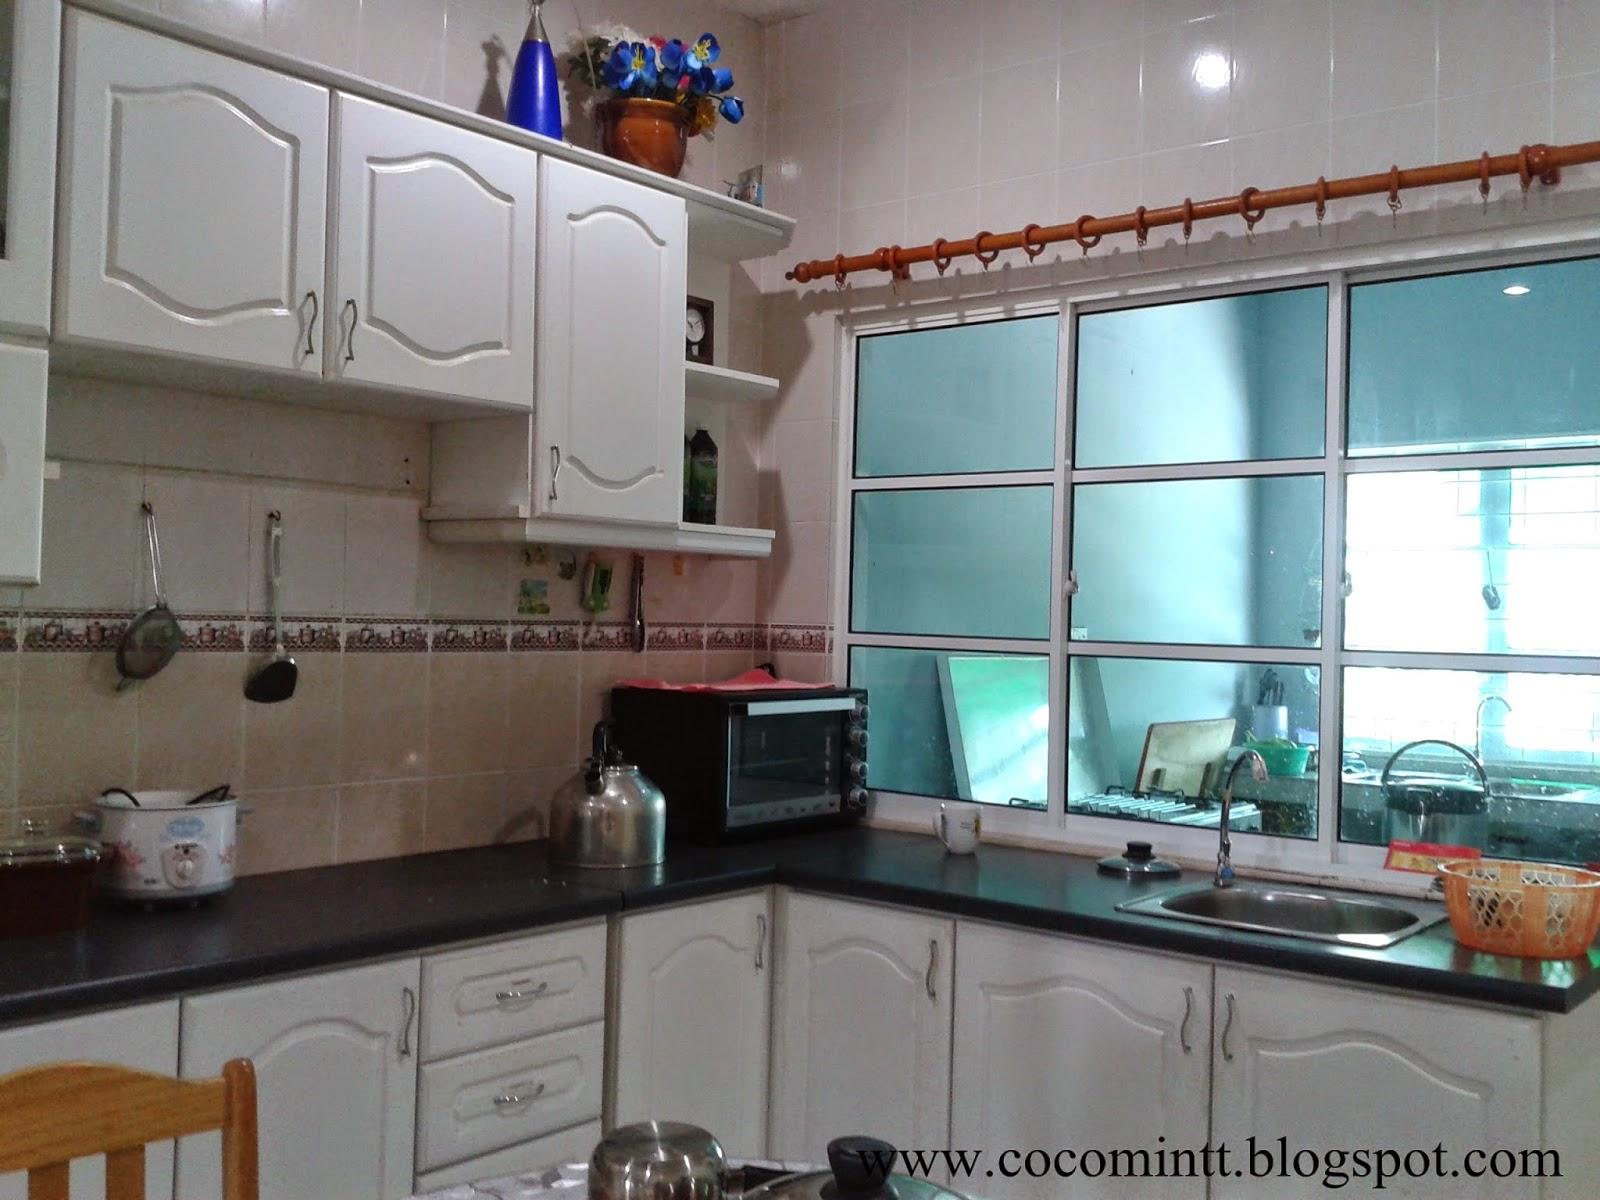 HOME IMPROVEMENT-THE WET KITCHEN | Coco Mint